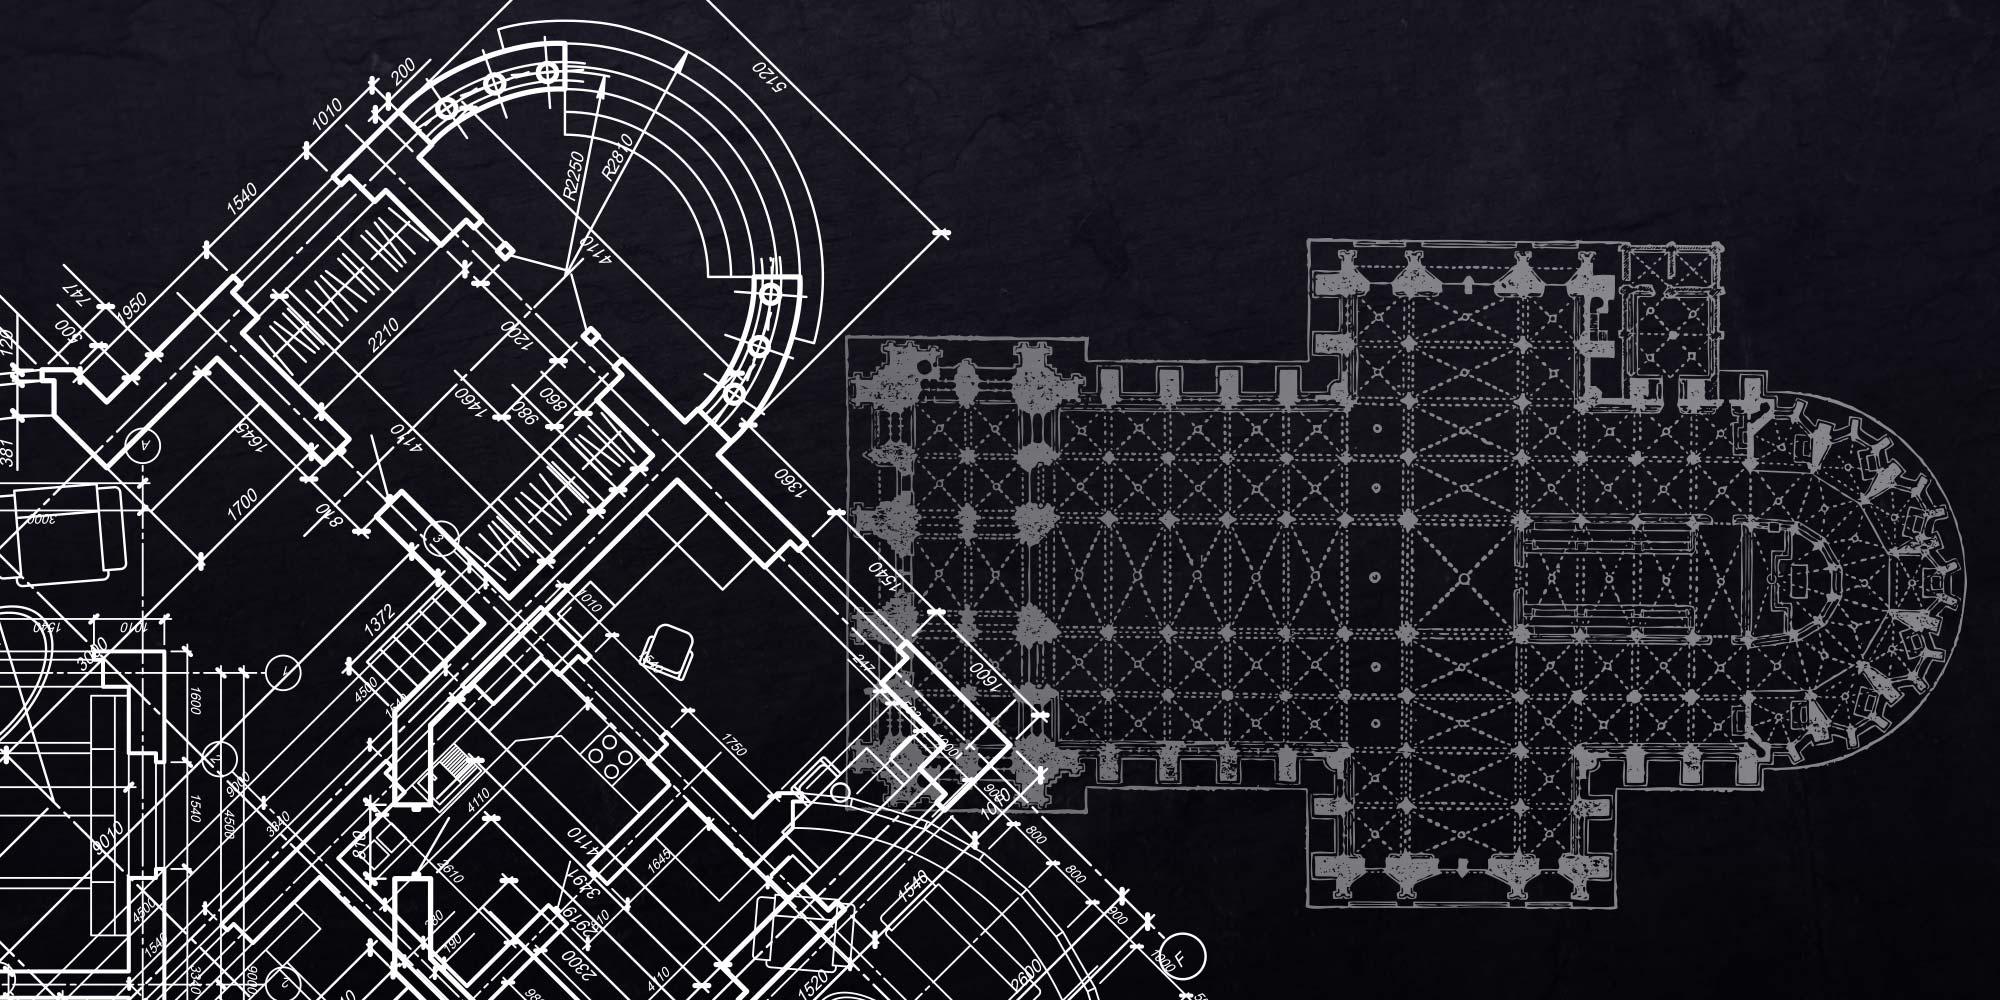 architecture-bg1.jpg